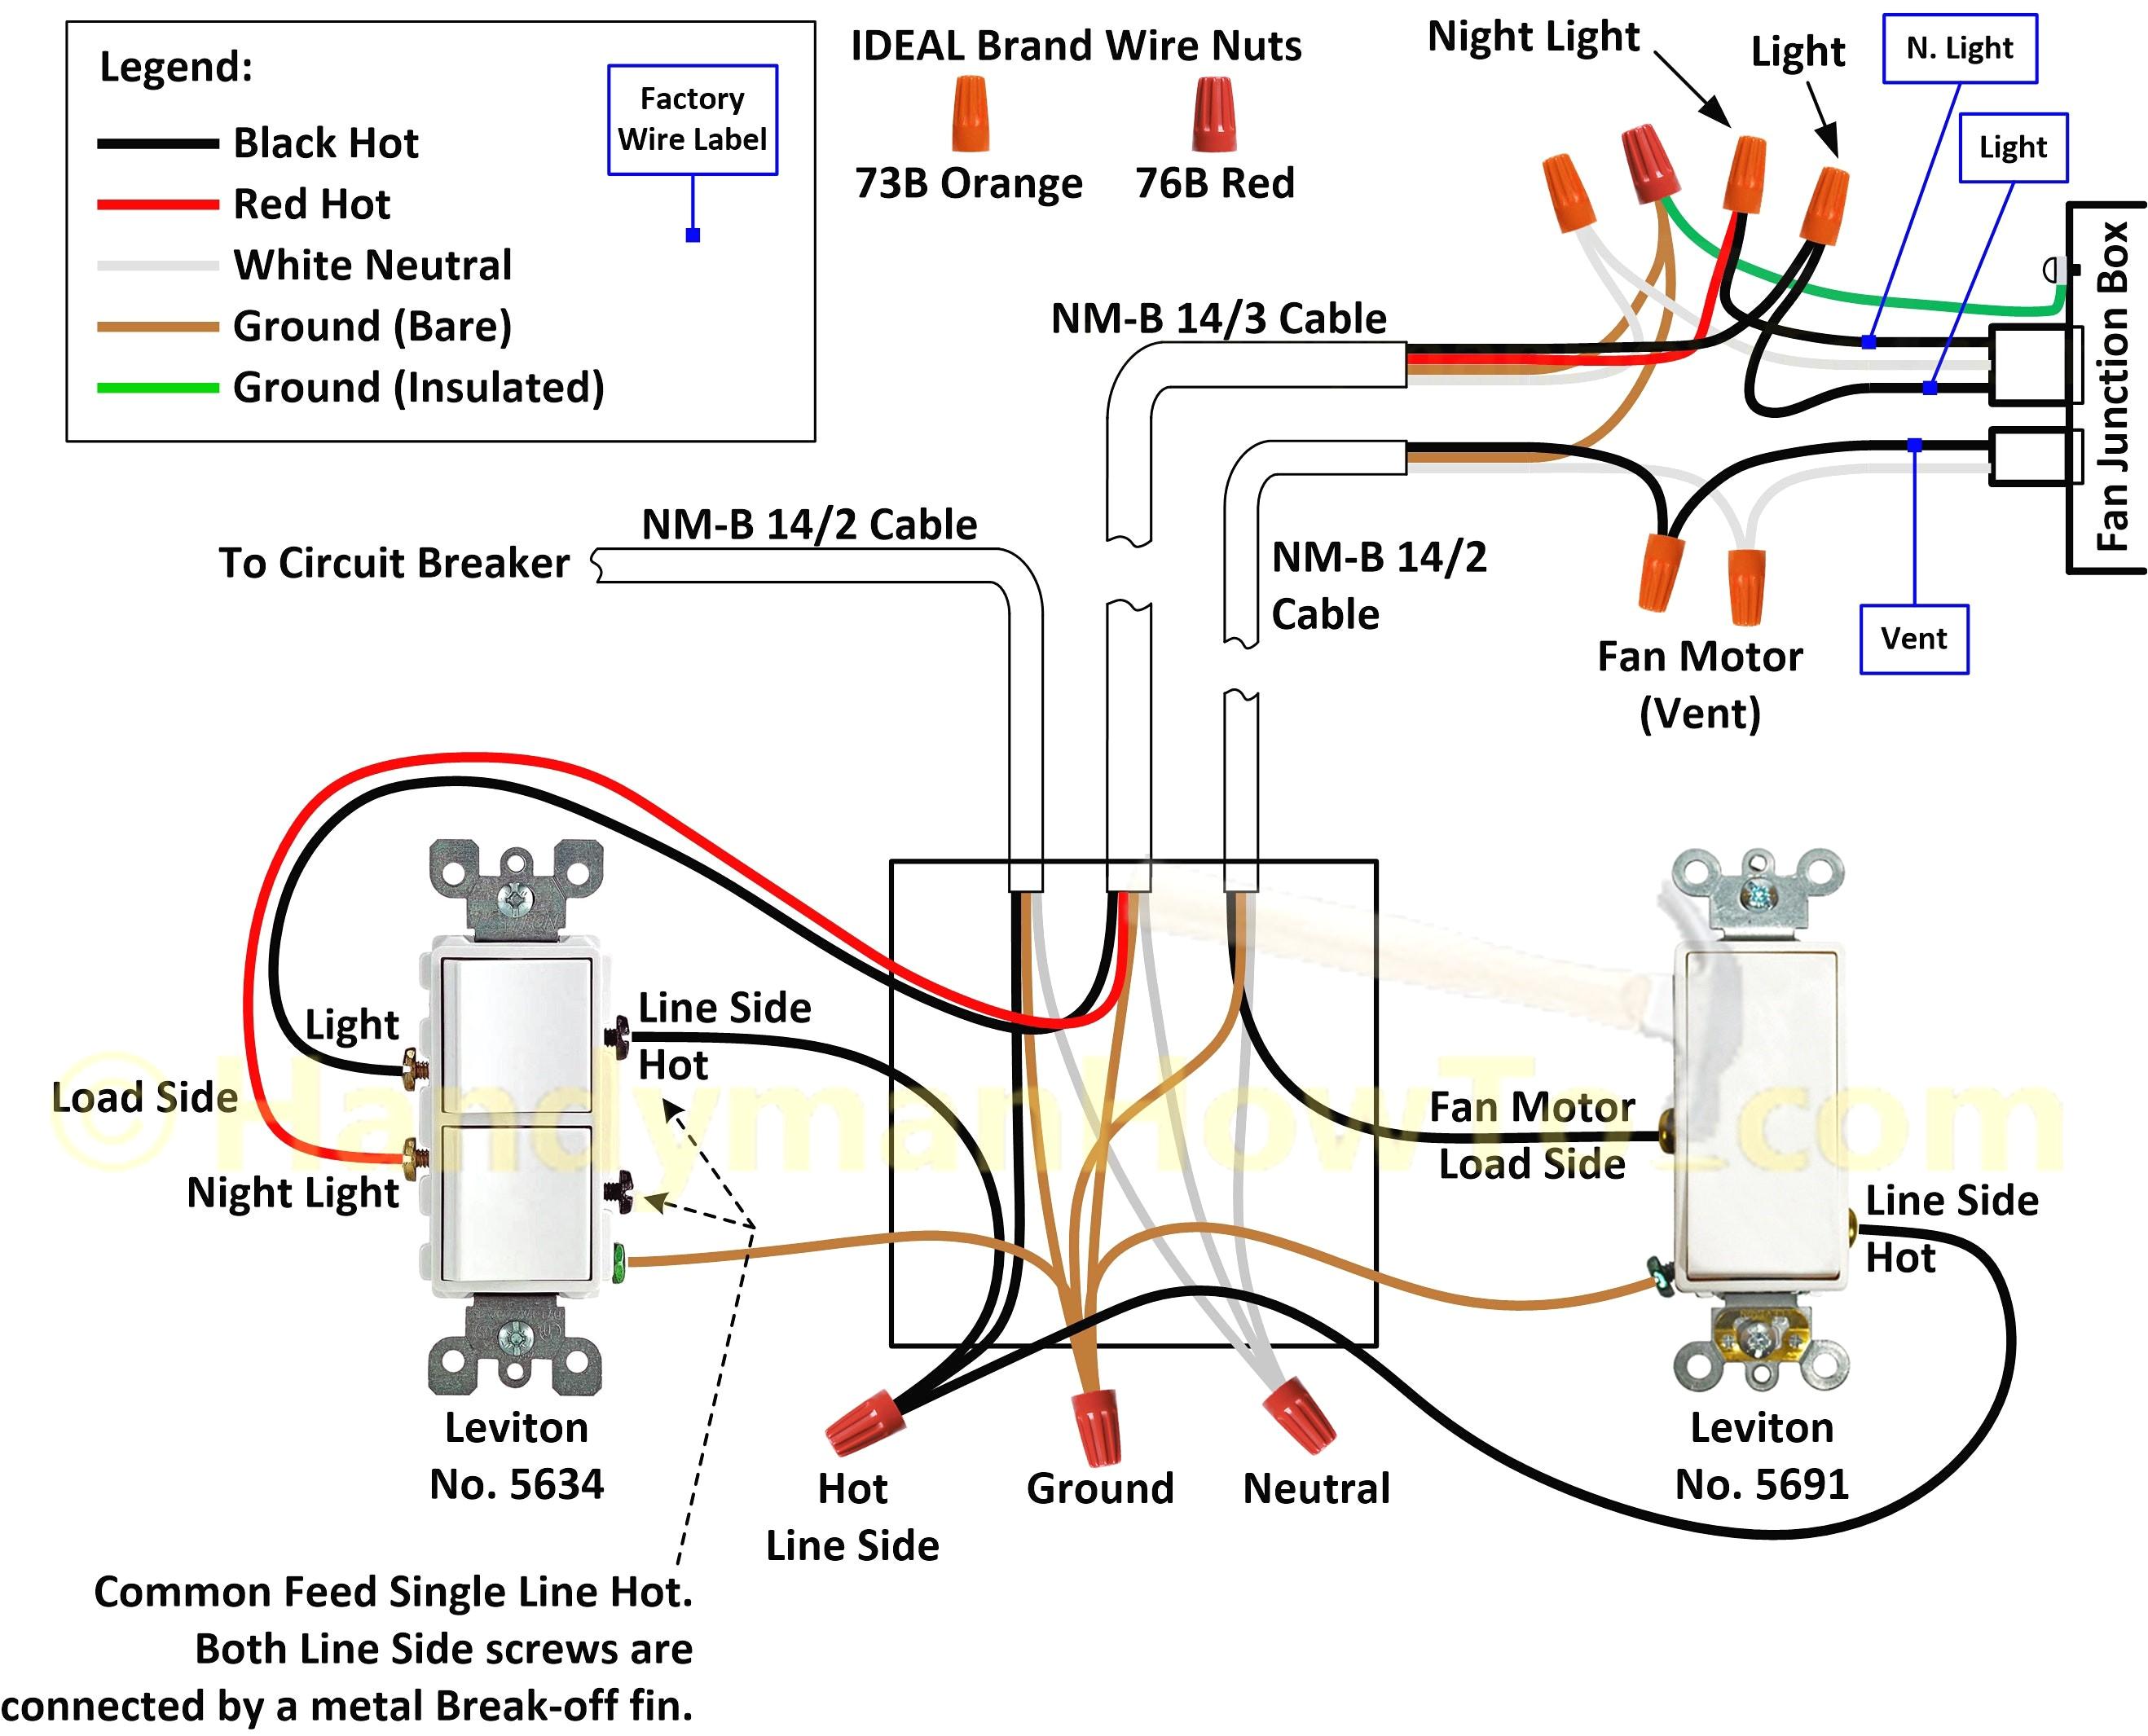 westinghouse fan wiring diagram wiring diagram expert westinghouse 3 speed fan switch 77021 wiring diagram westinghouse